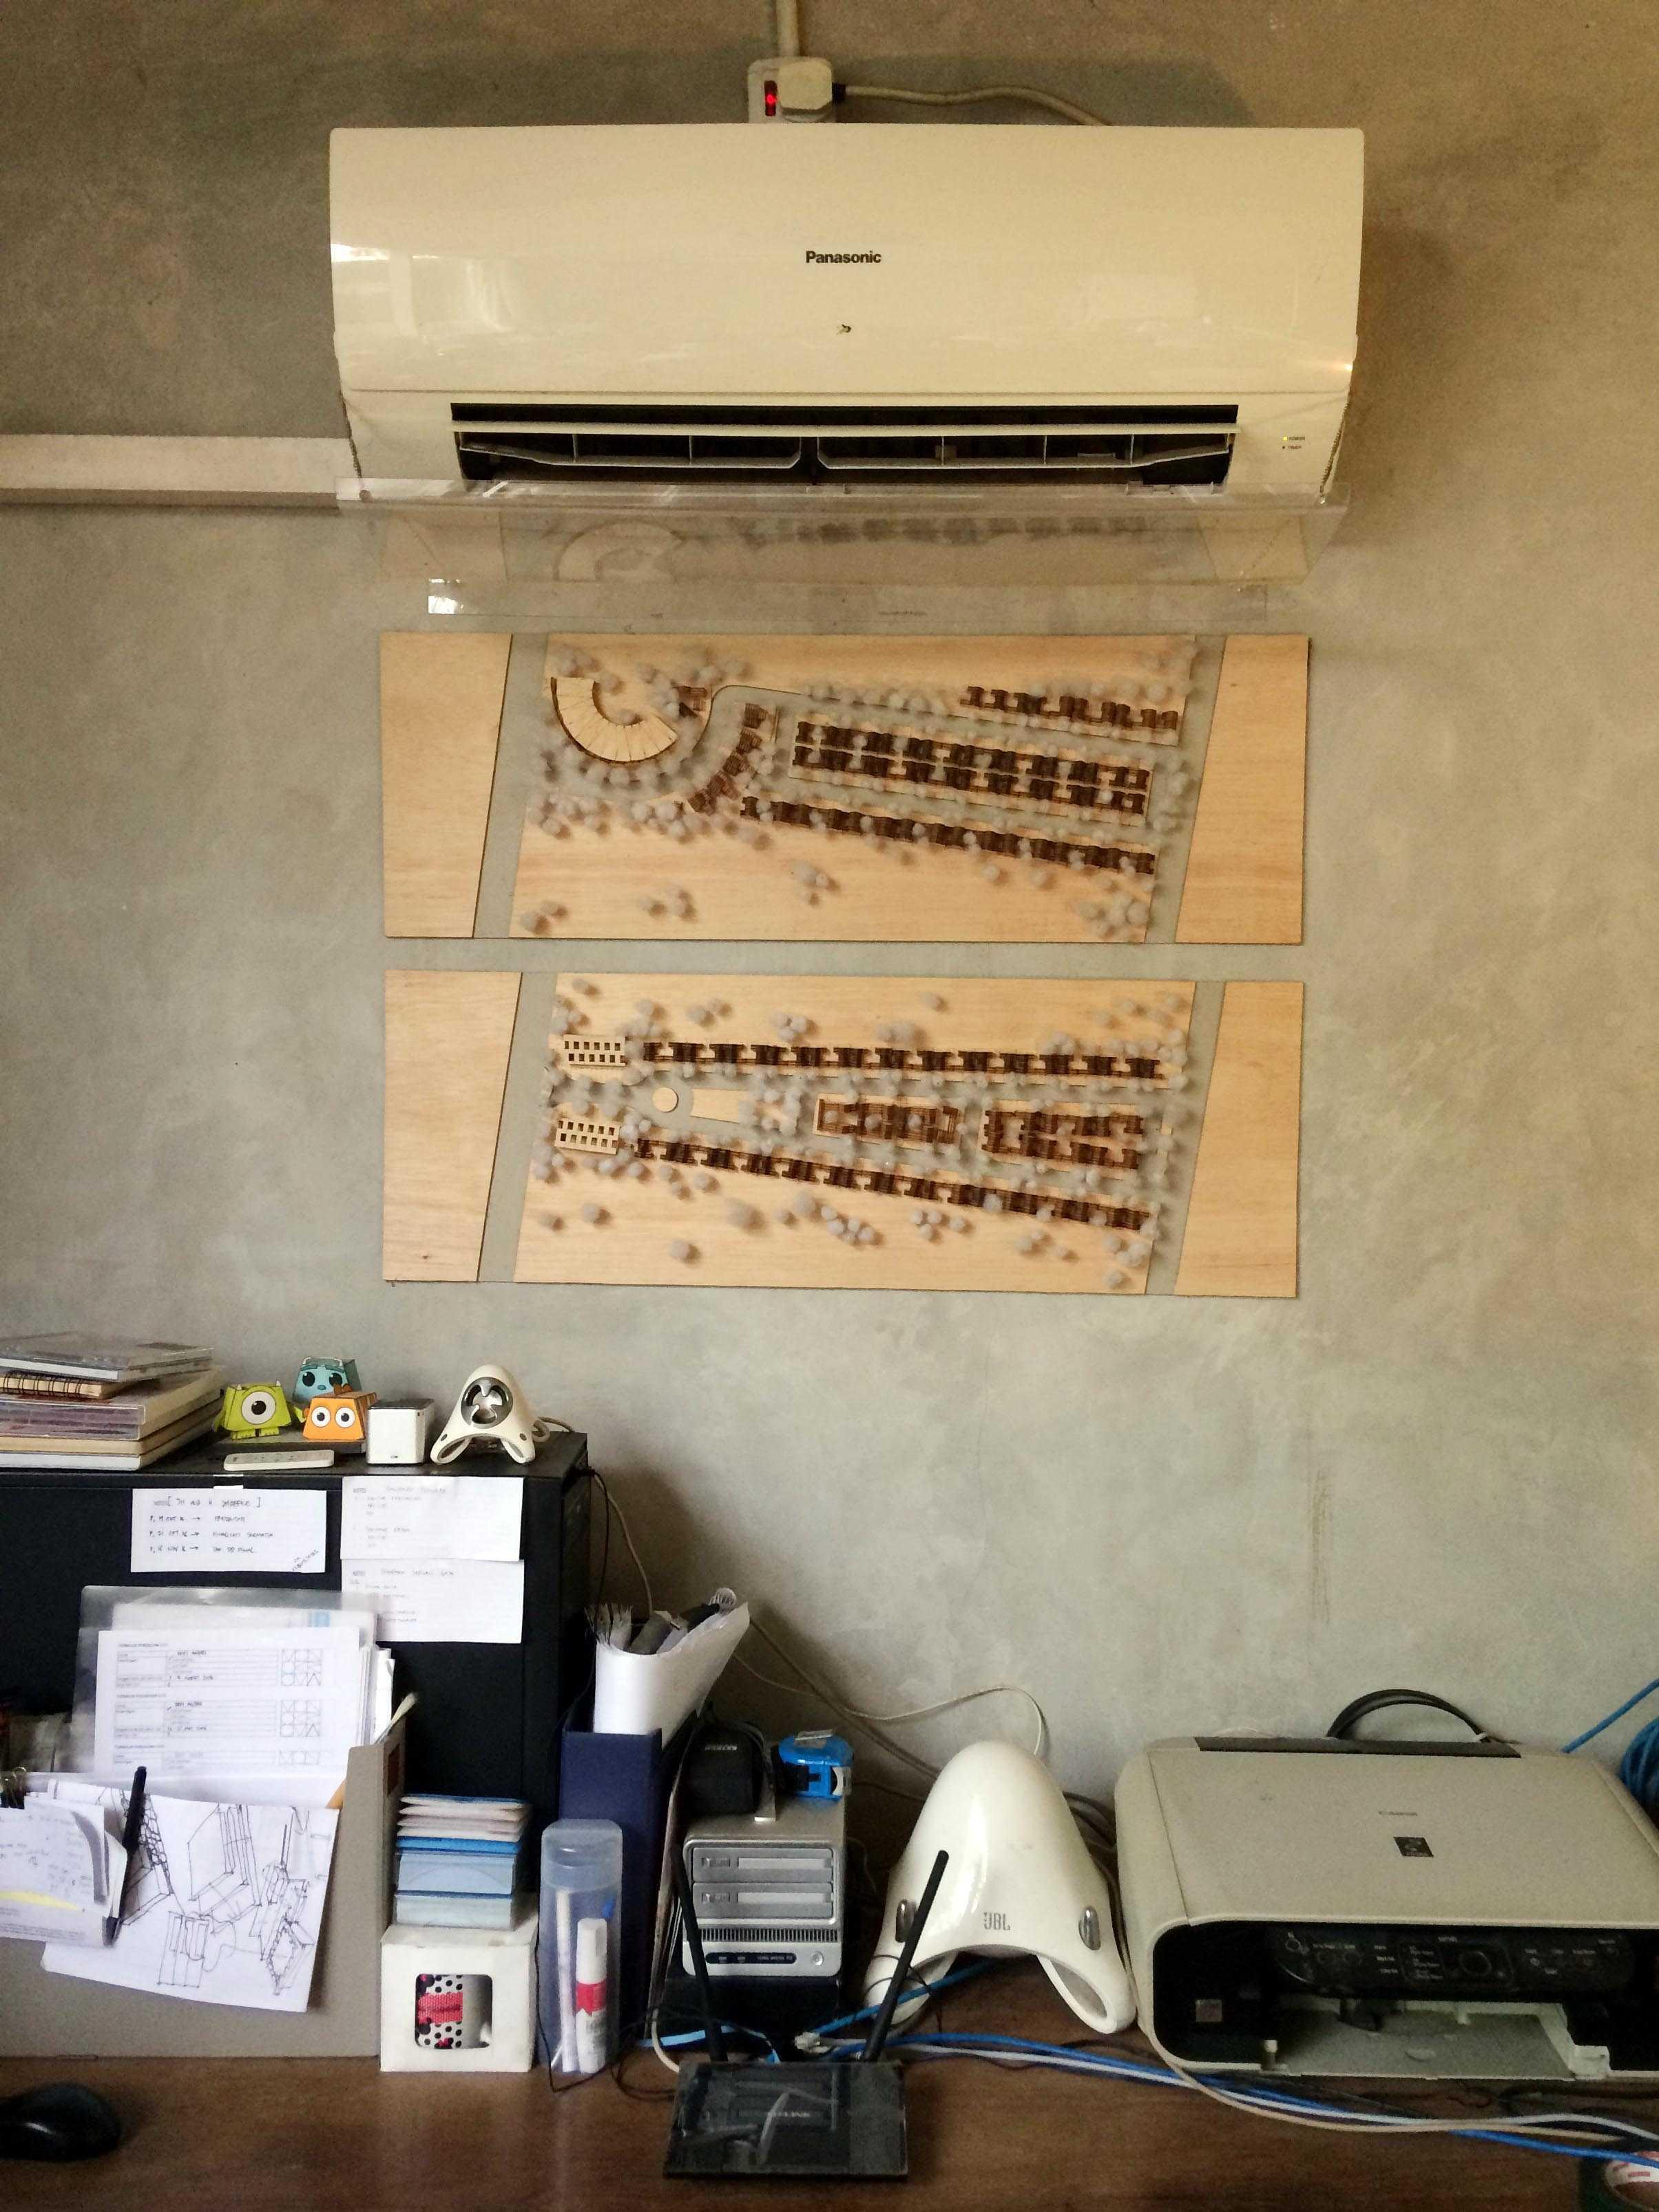 Monokroma Architect Monokroma Architect Office Lippo Karawaci Lippo Karawaci 10-Wall Modern  23592